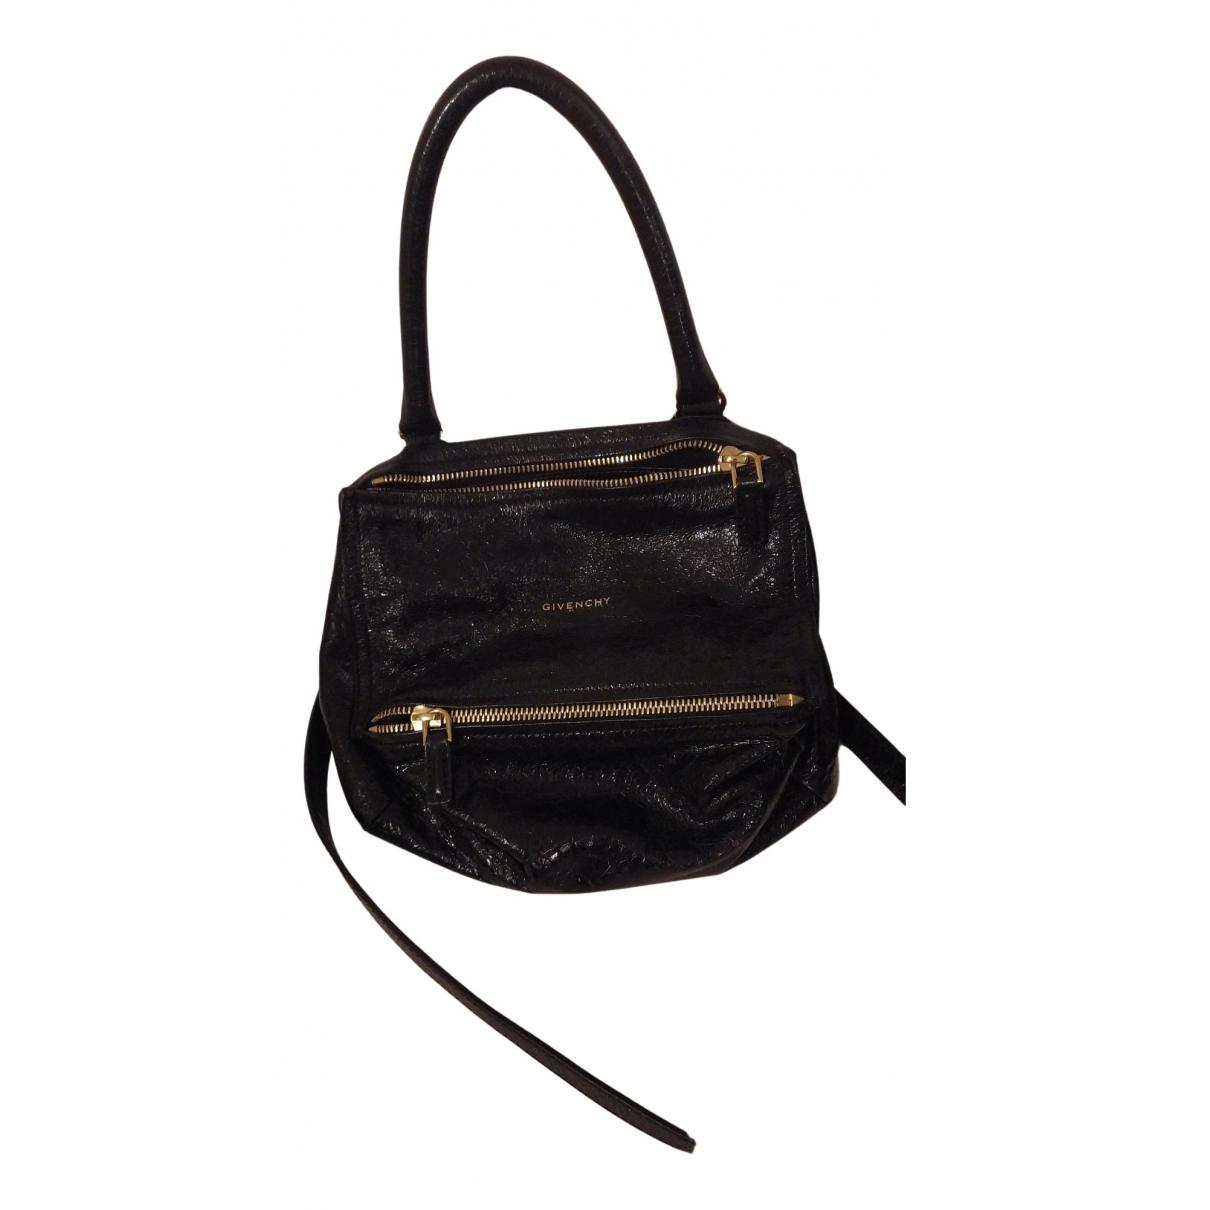 Givenchy Pandora Black Patent leather handbag for Women N